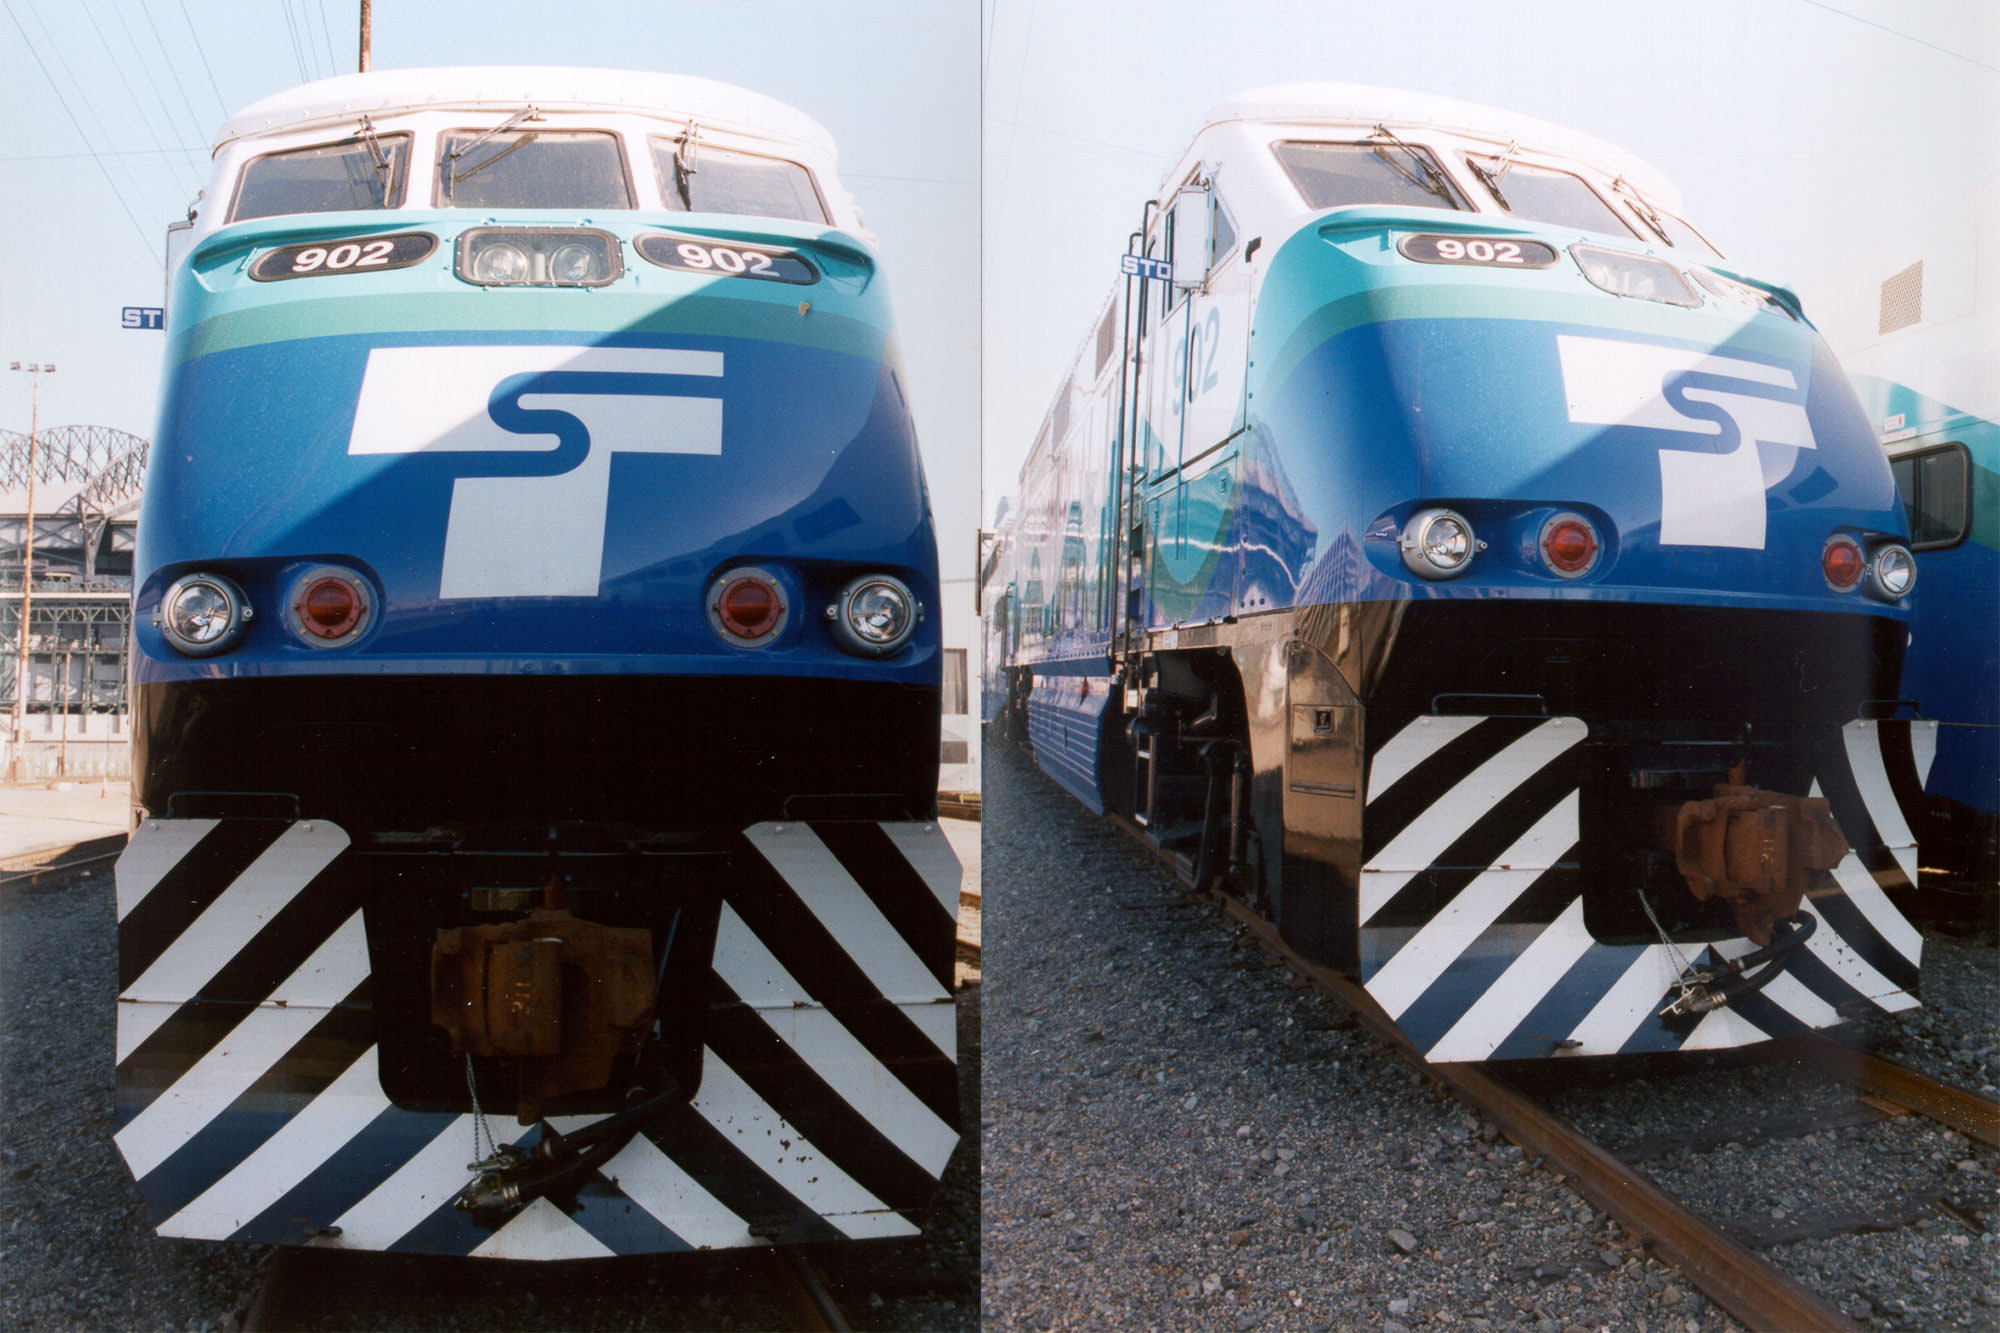 Tacoma Trestle Commuter Rail Photo